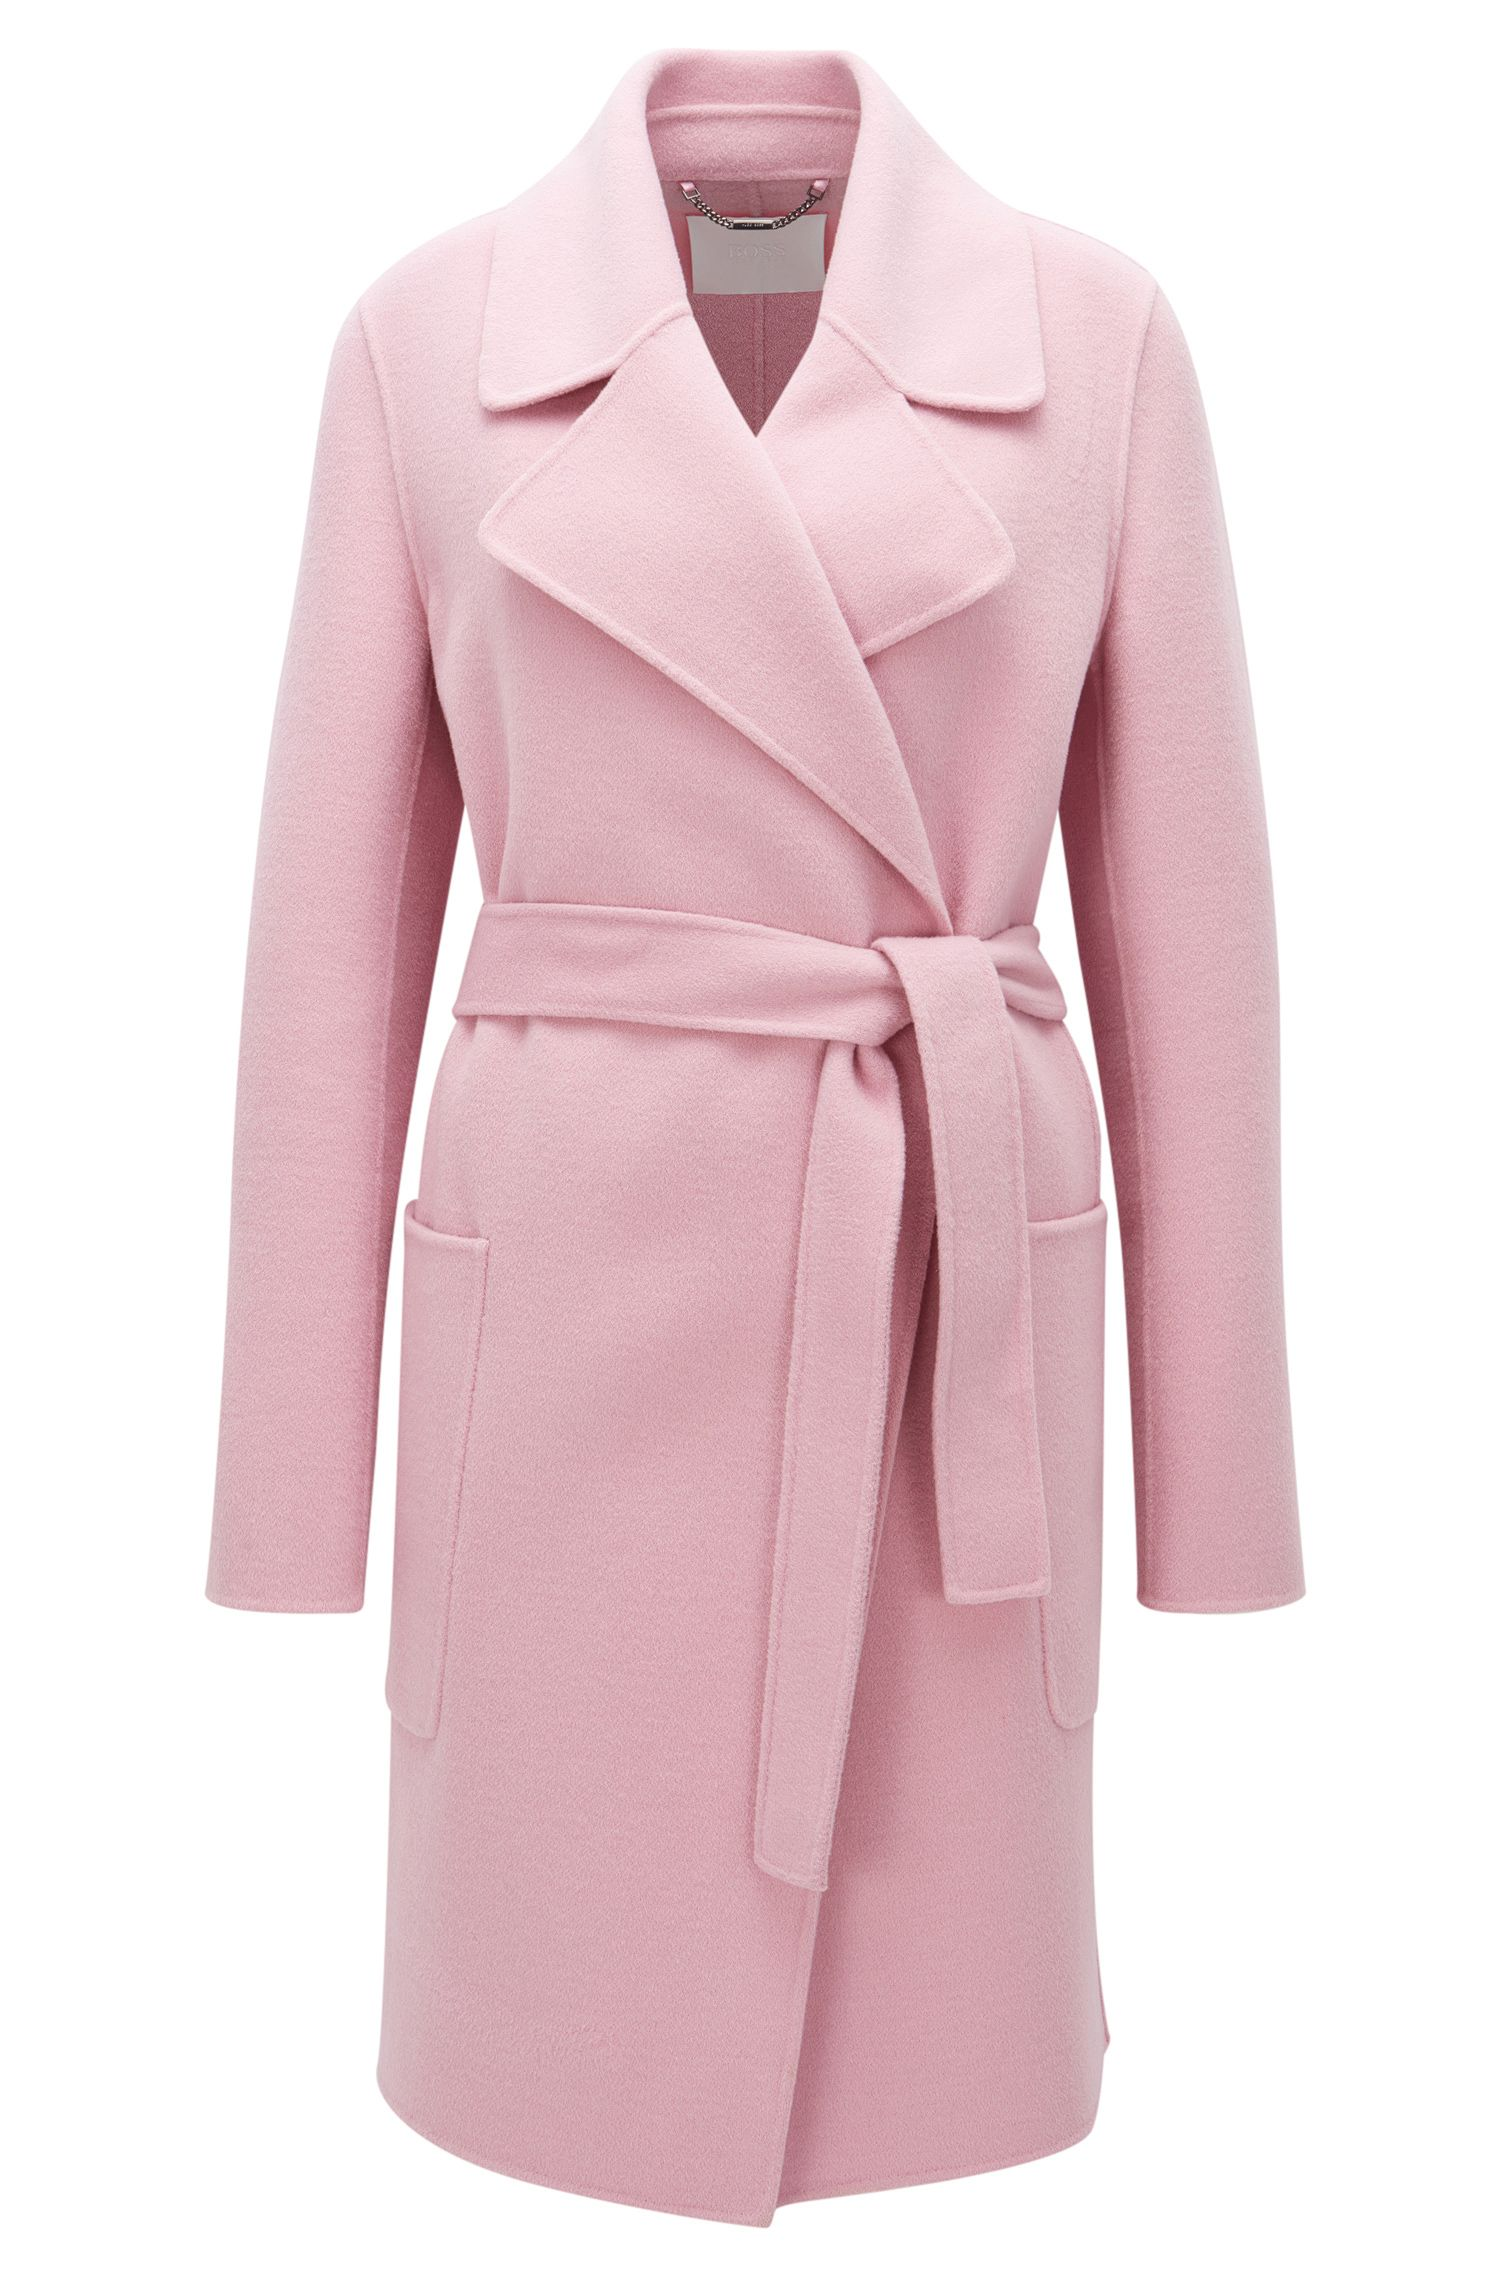 Virgin Wool Coat | Citana